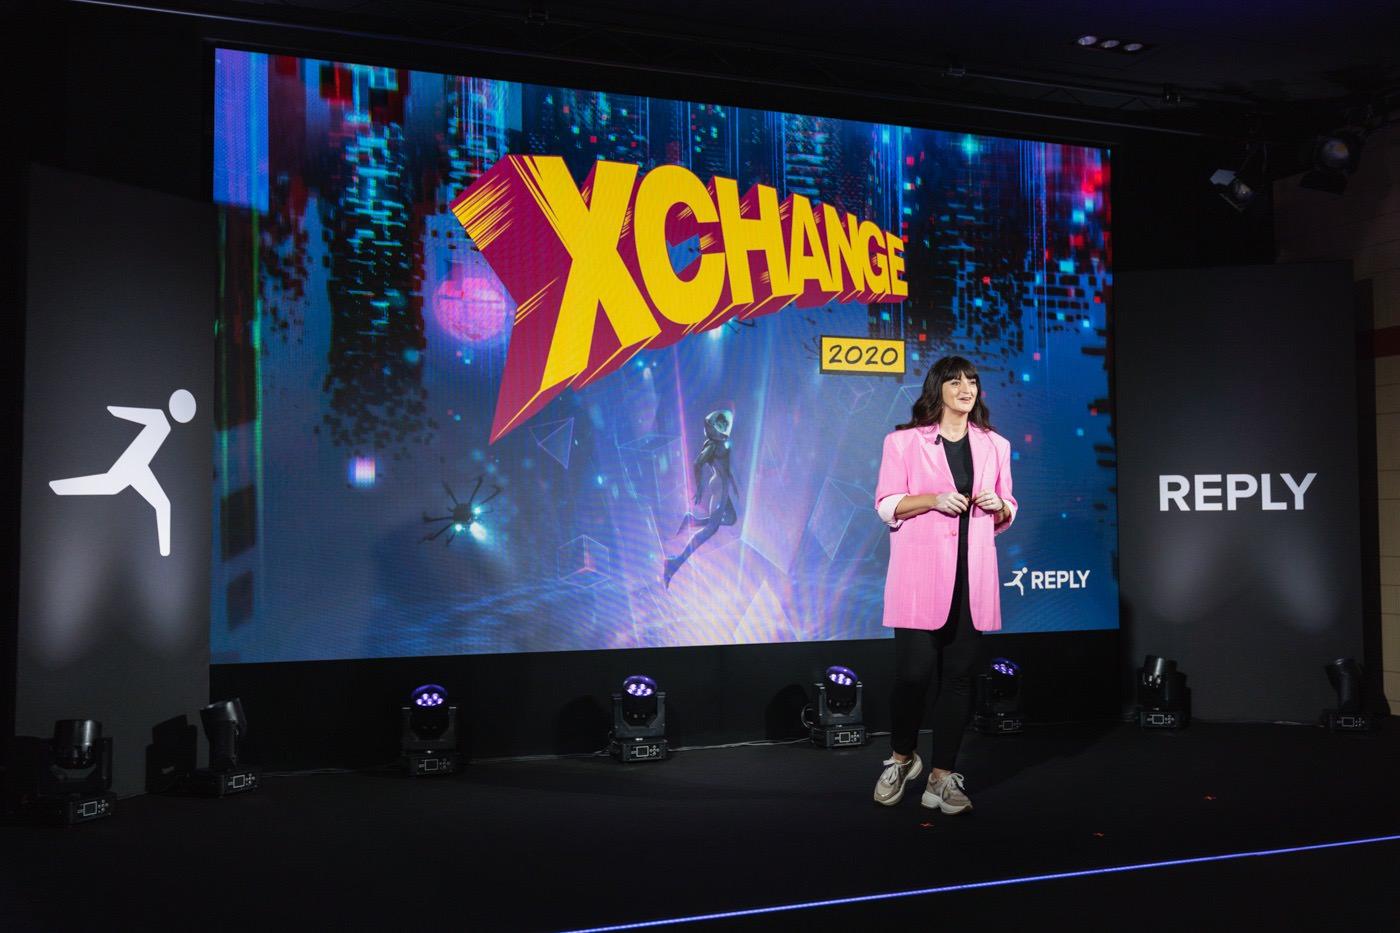 reply-xchange-2020-gruppo-peroni-eventi-00